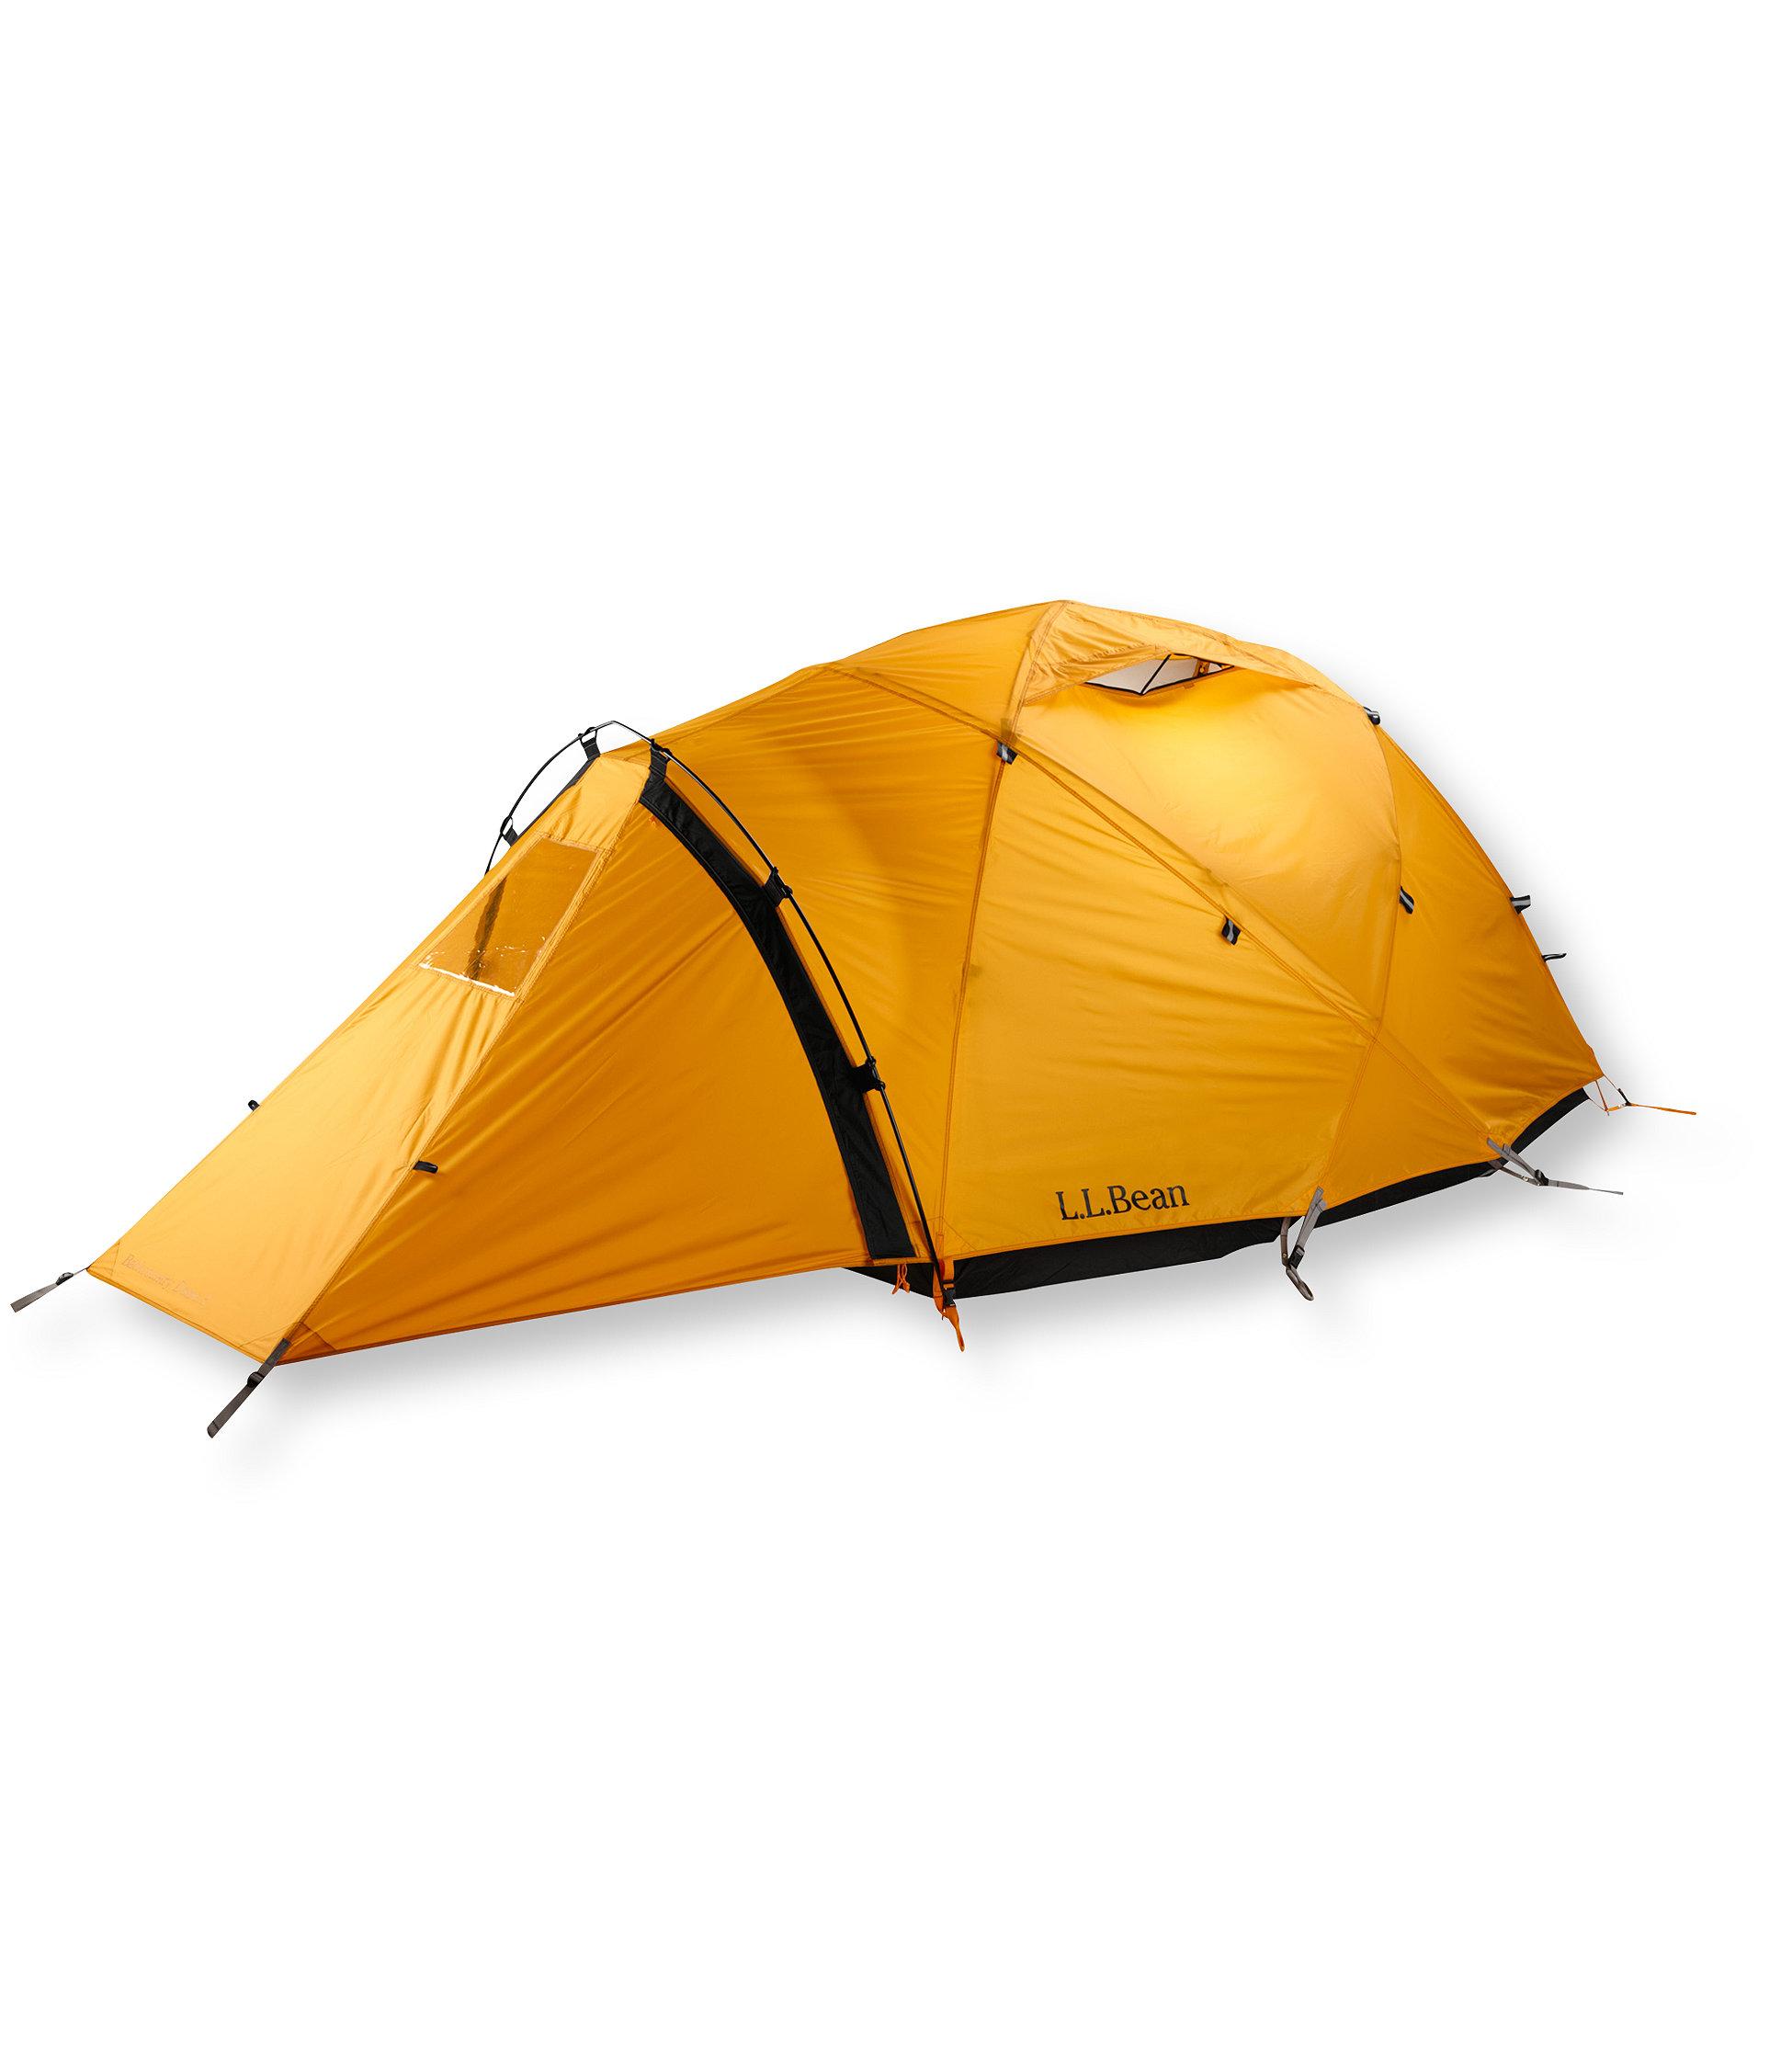 L.L.Bean Backcountry 3-Person Dome